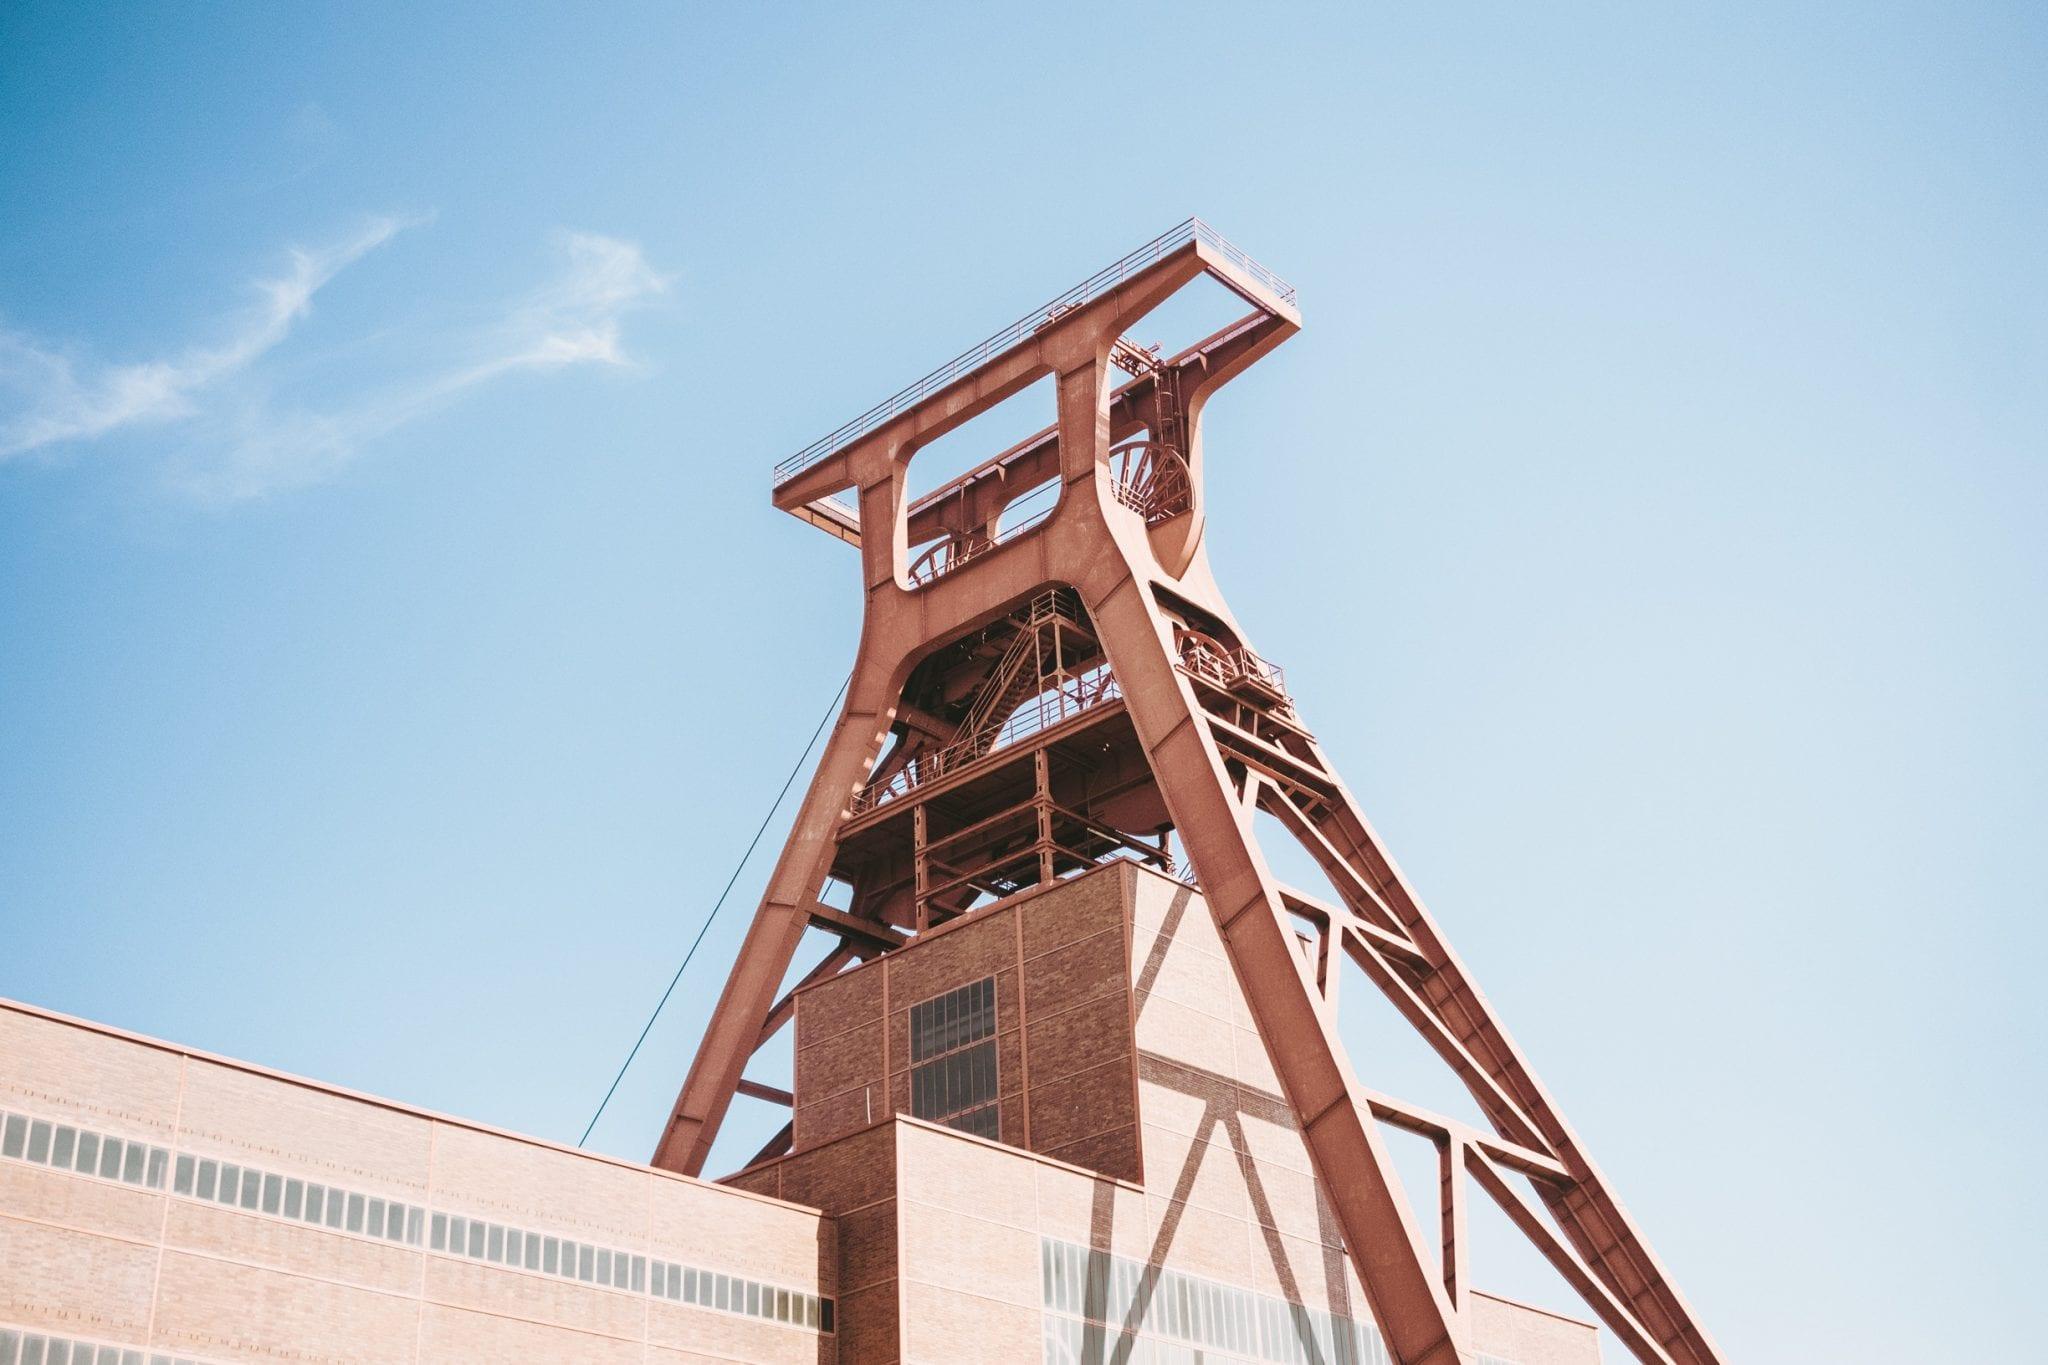 Ruhrgebied-simon-basler-418955-unsplash